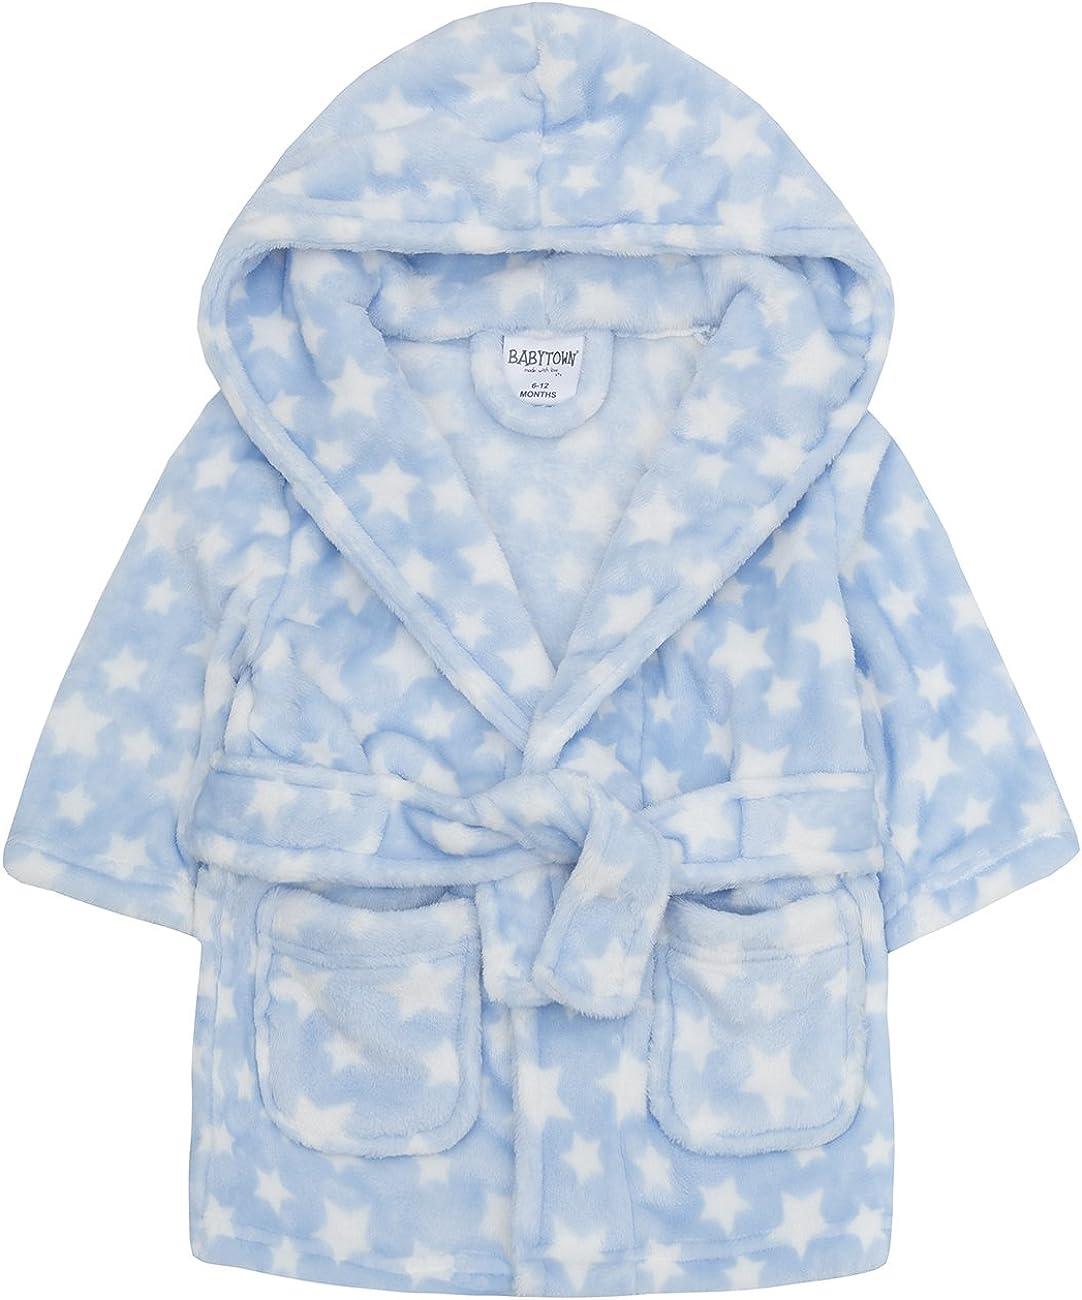 Ages 6-24 Months Soft Plush Flannel Fleece Hooded Bath Robe BabyTown Baby Boys /& Girls Unisex Dressing Gown